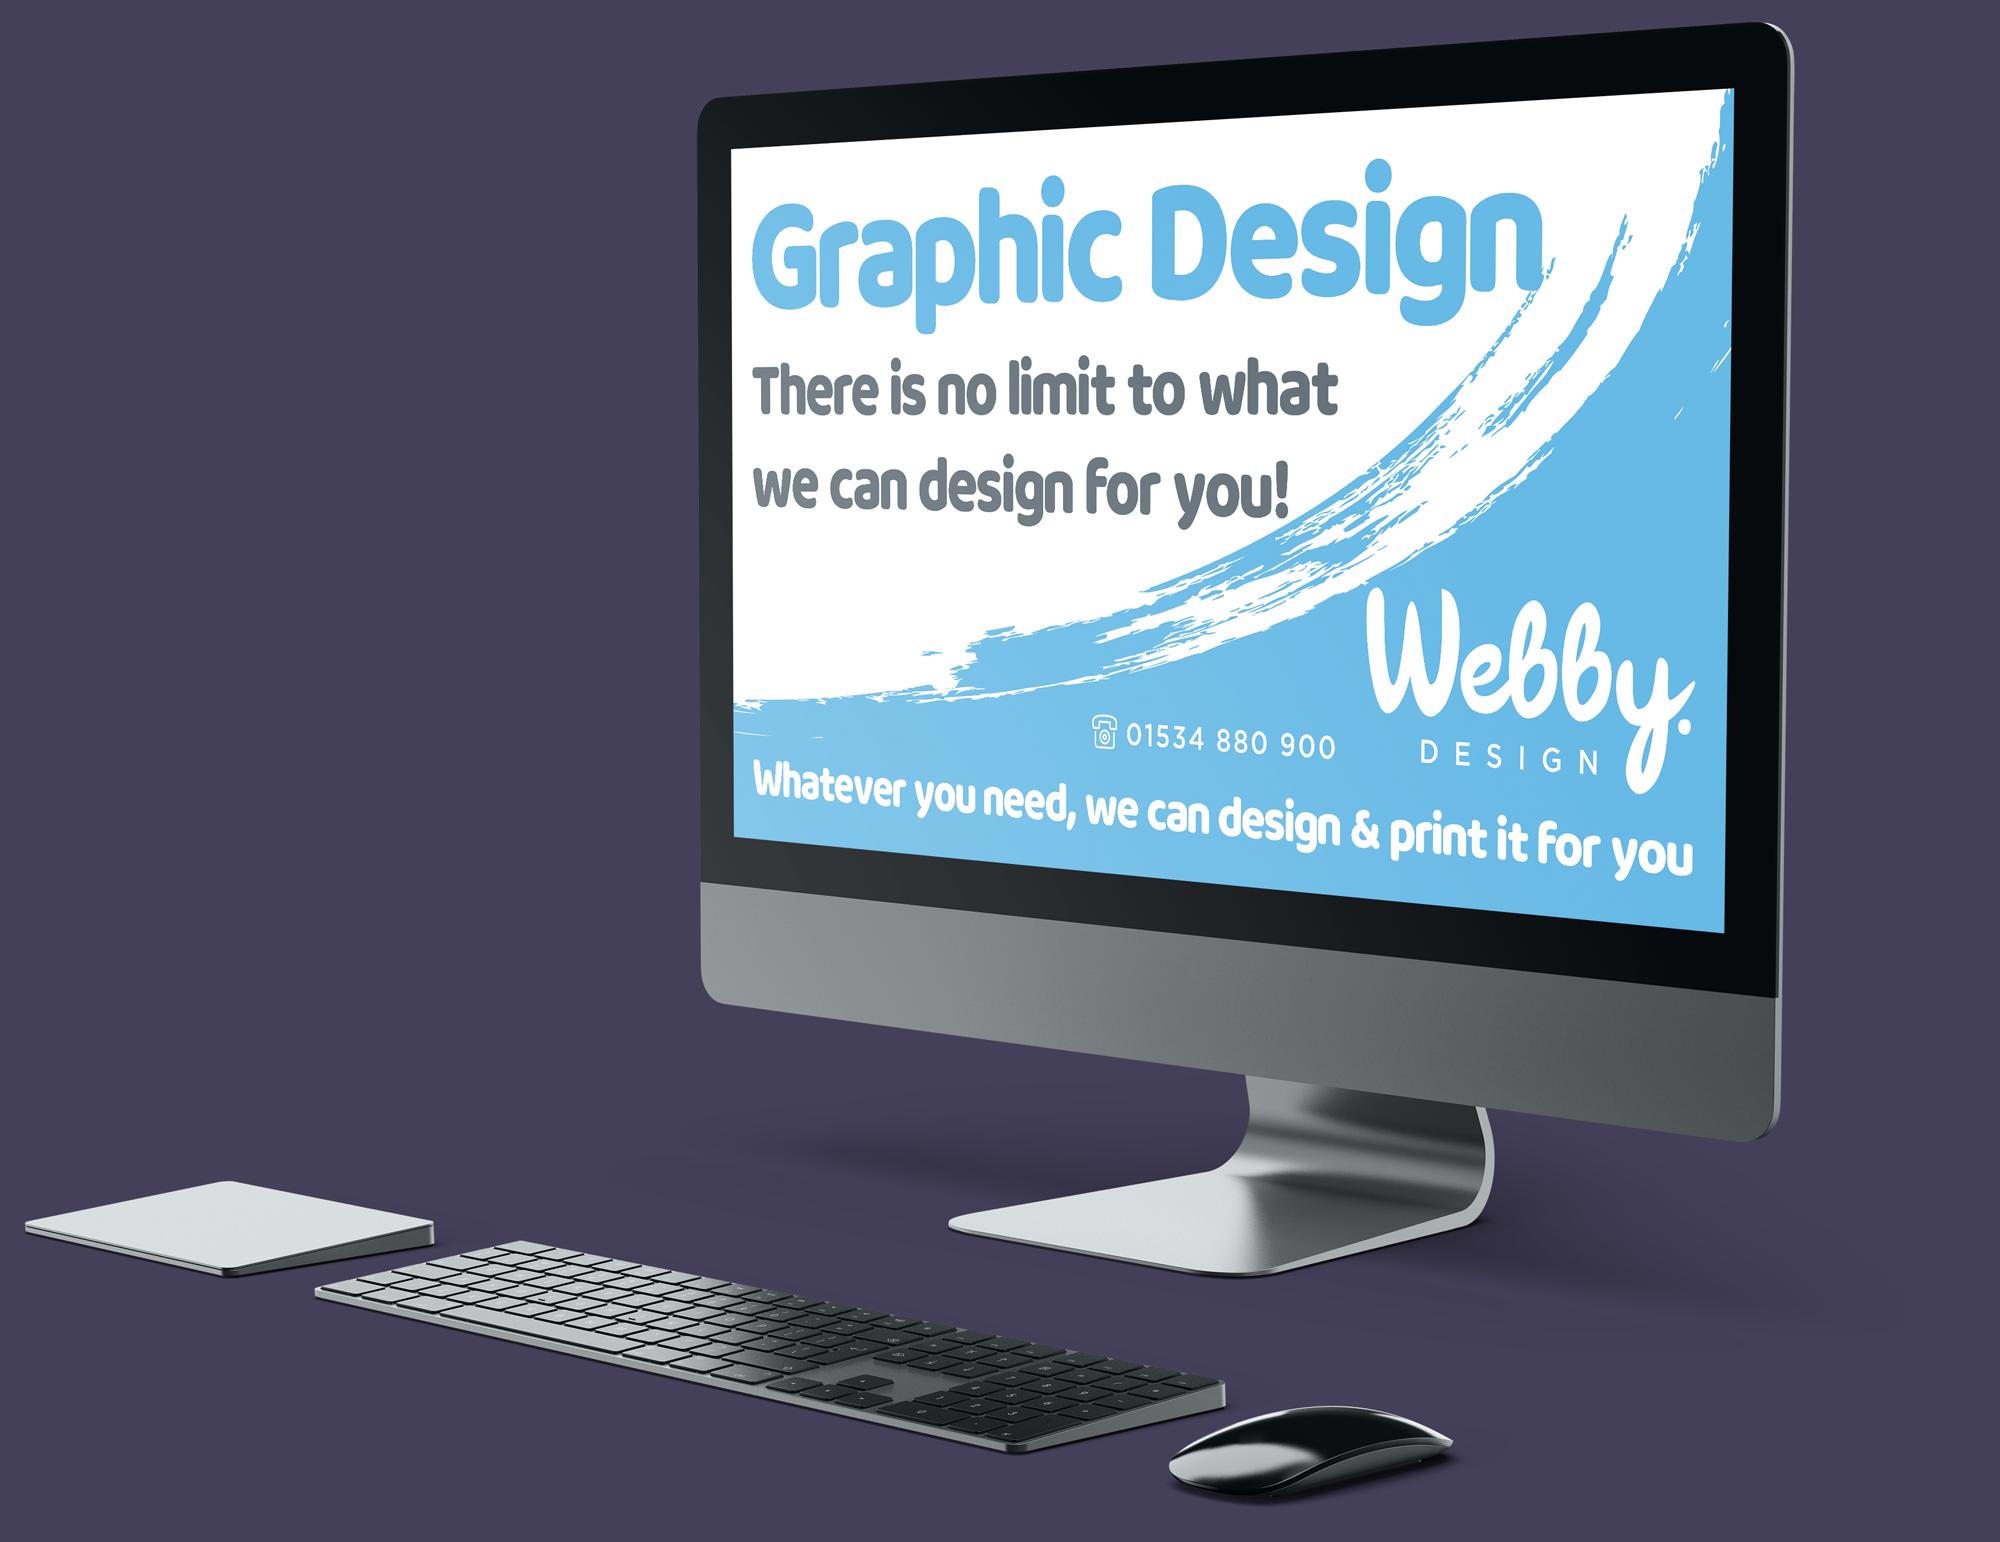 Webby.Design Graphic design Services